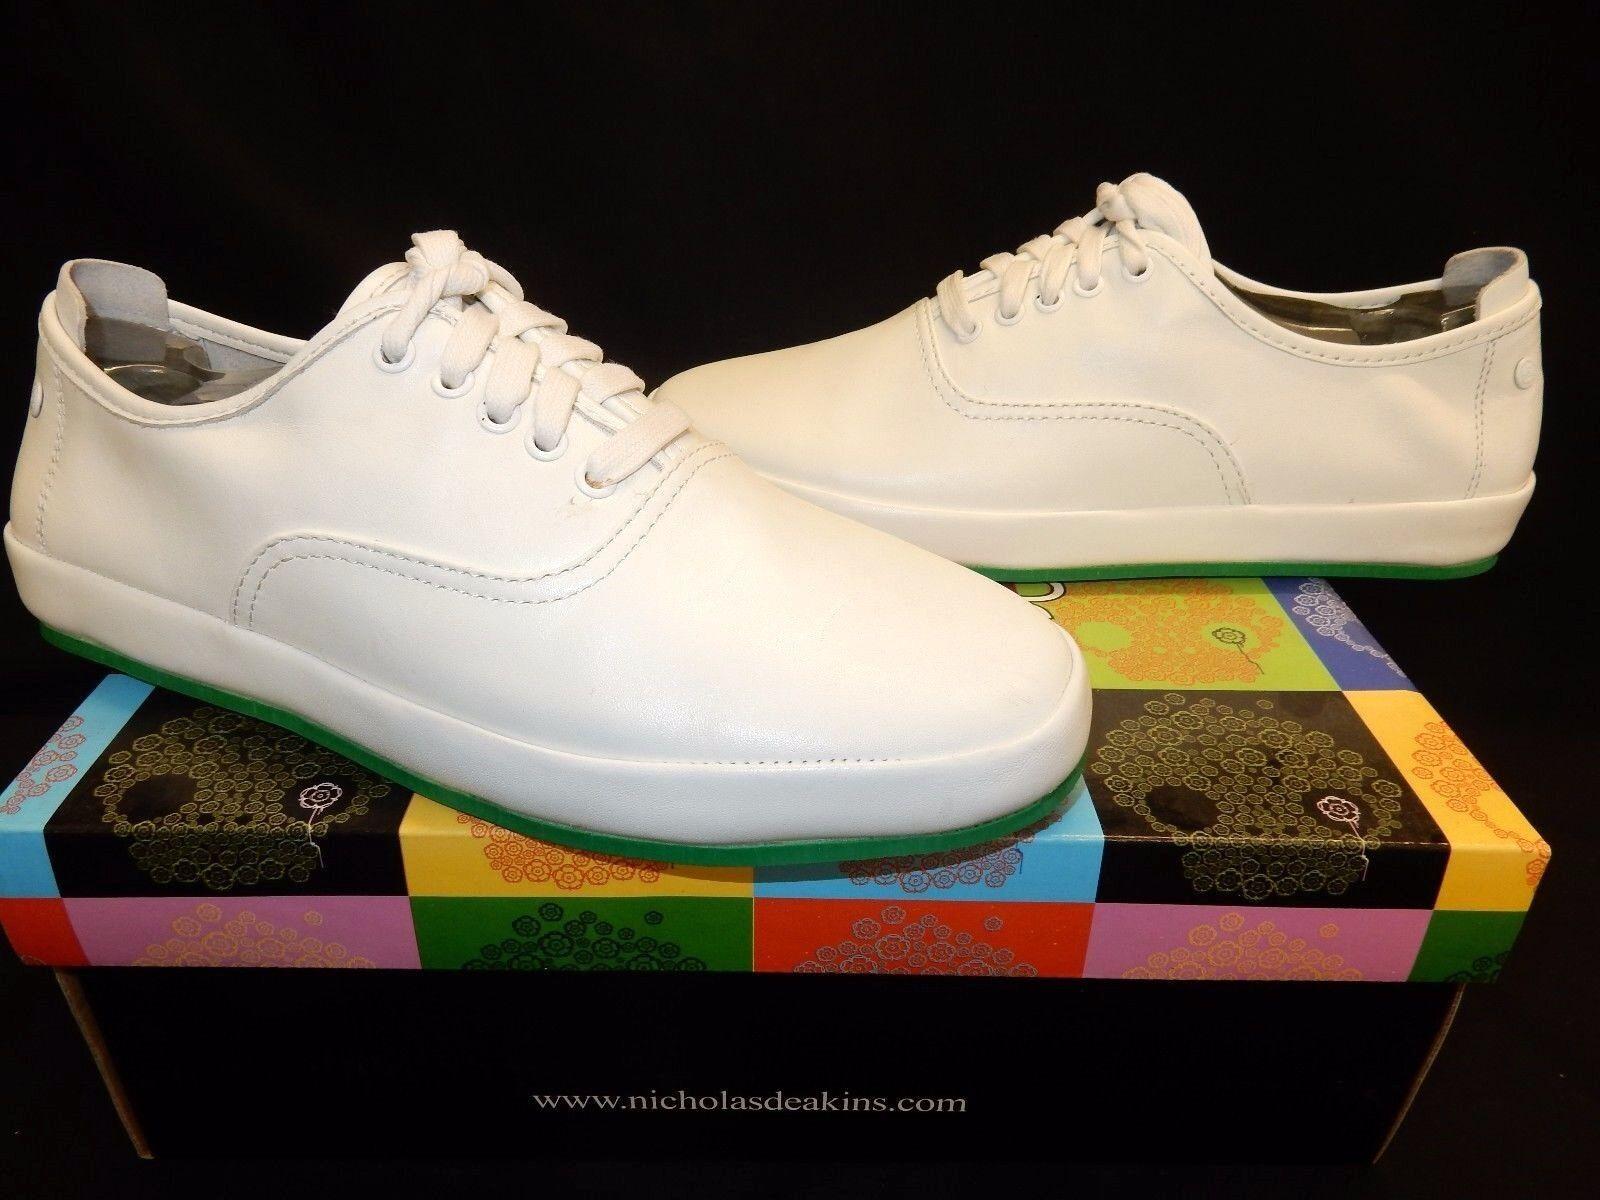 Mens Nicholas Deakins Seawolf Leather shoes RRP .95